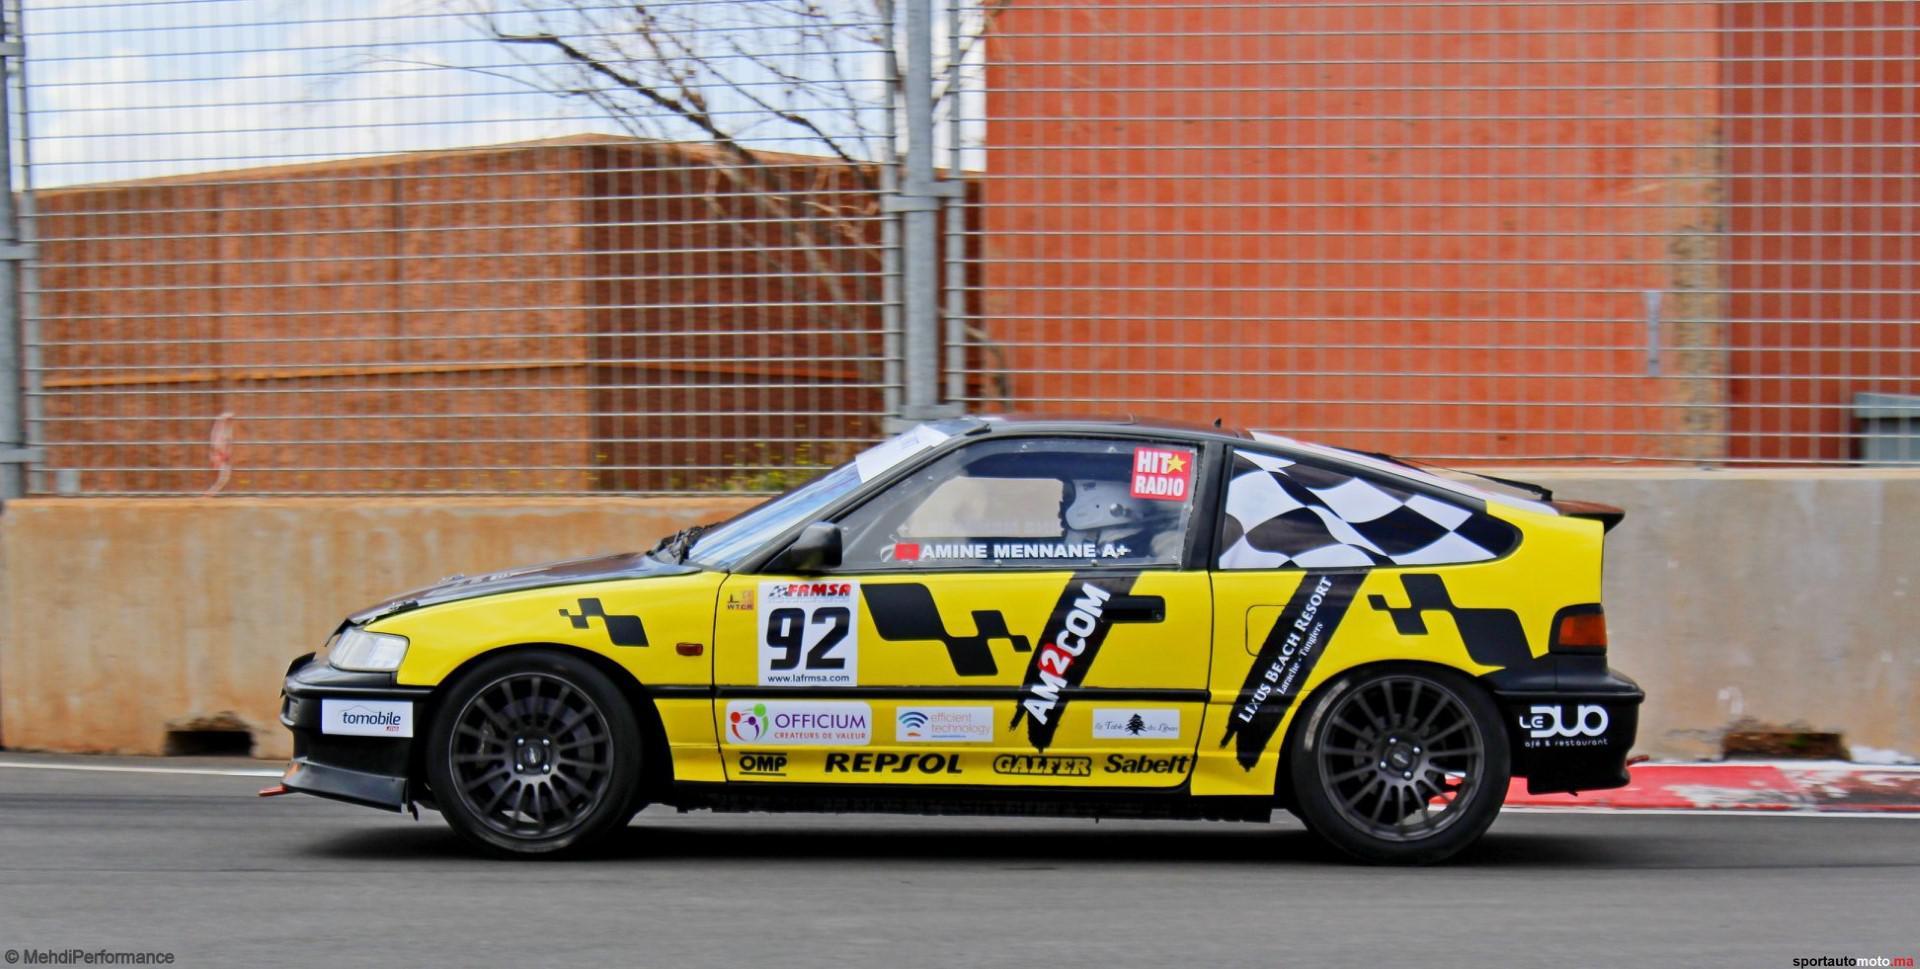 qui-sont-team-am-racing-1043-7.jpg